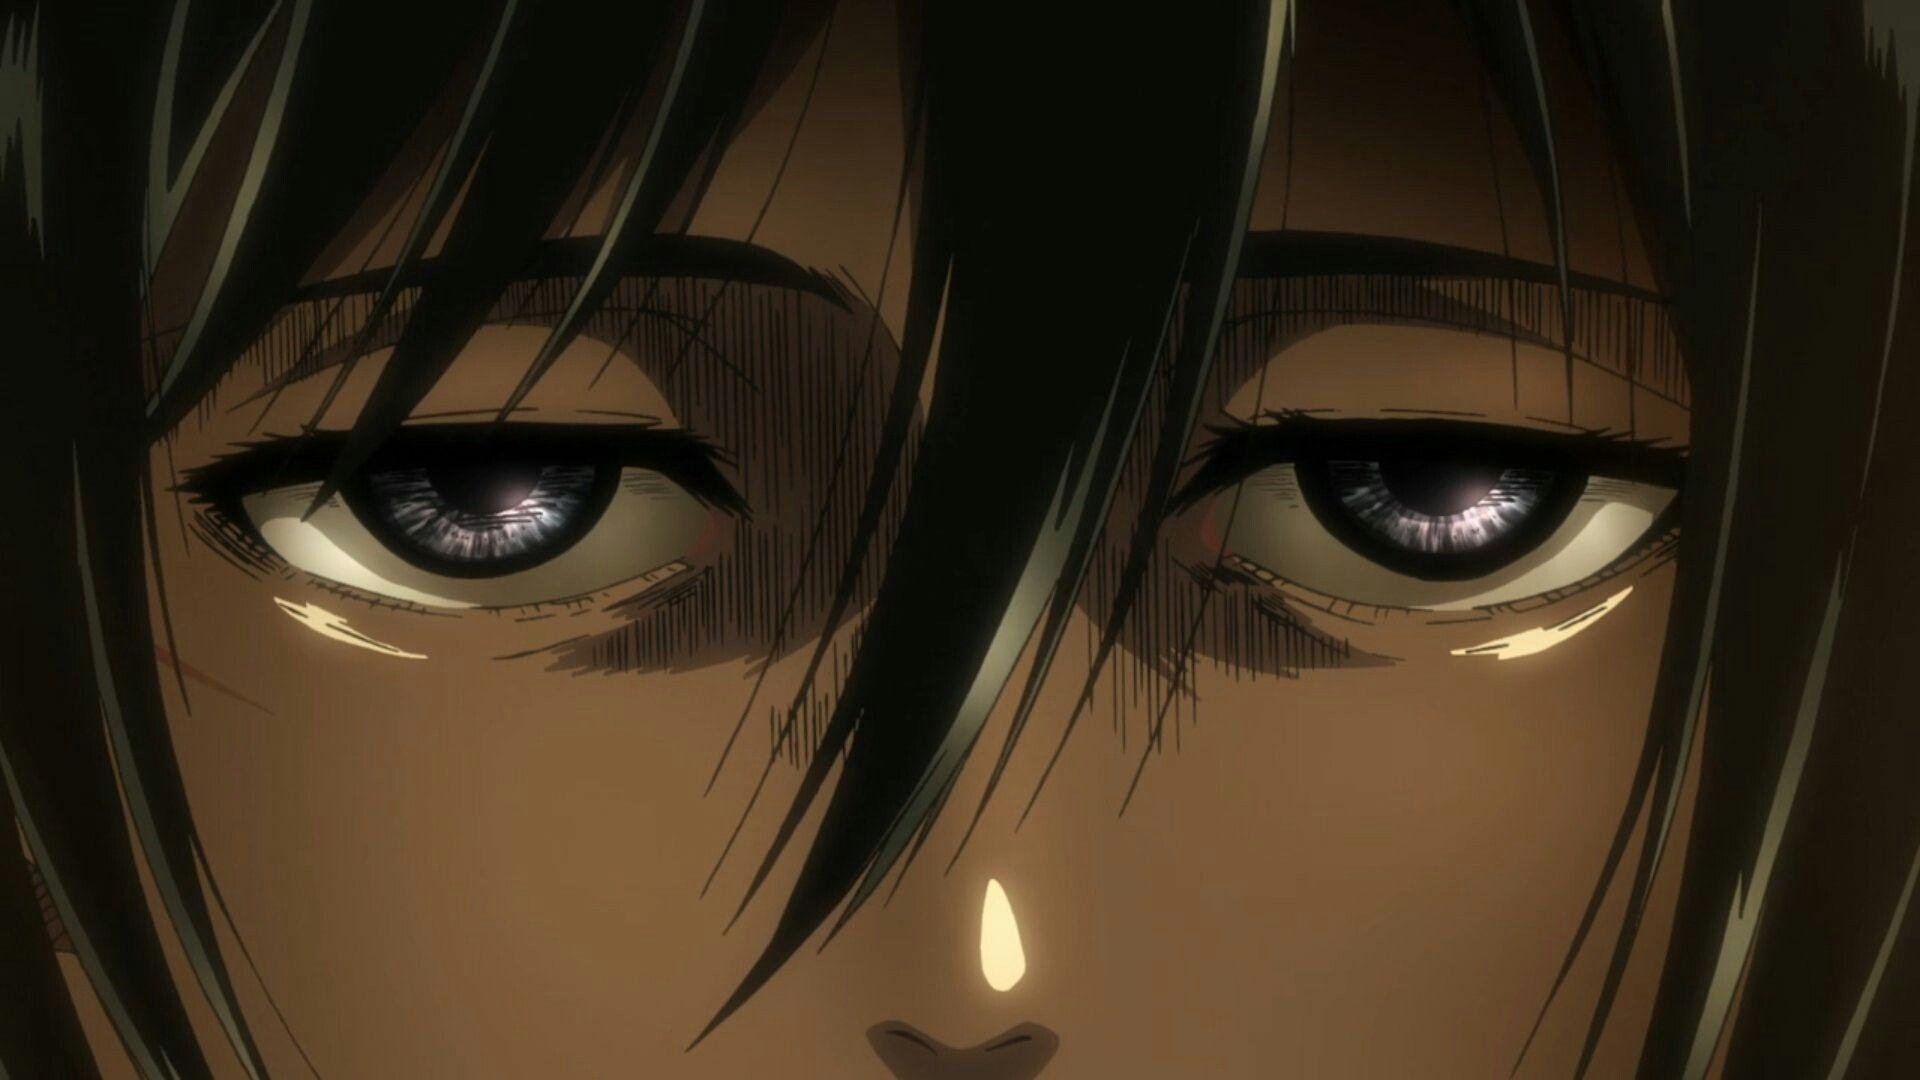 Shingeki no kyojin 3° Temporada, episódio 11 Espectador